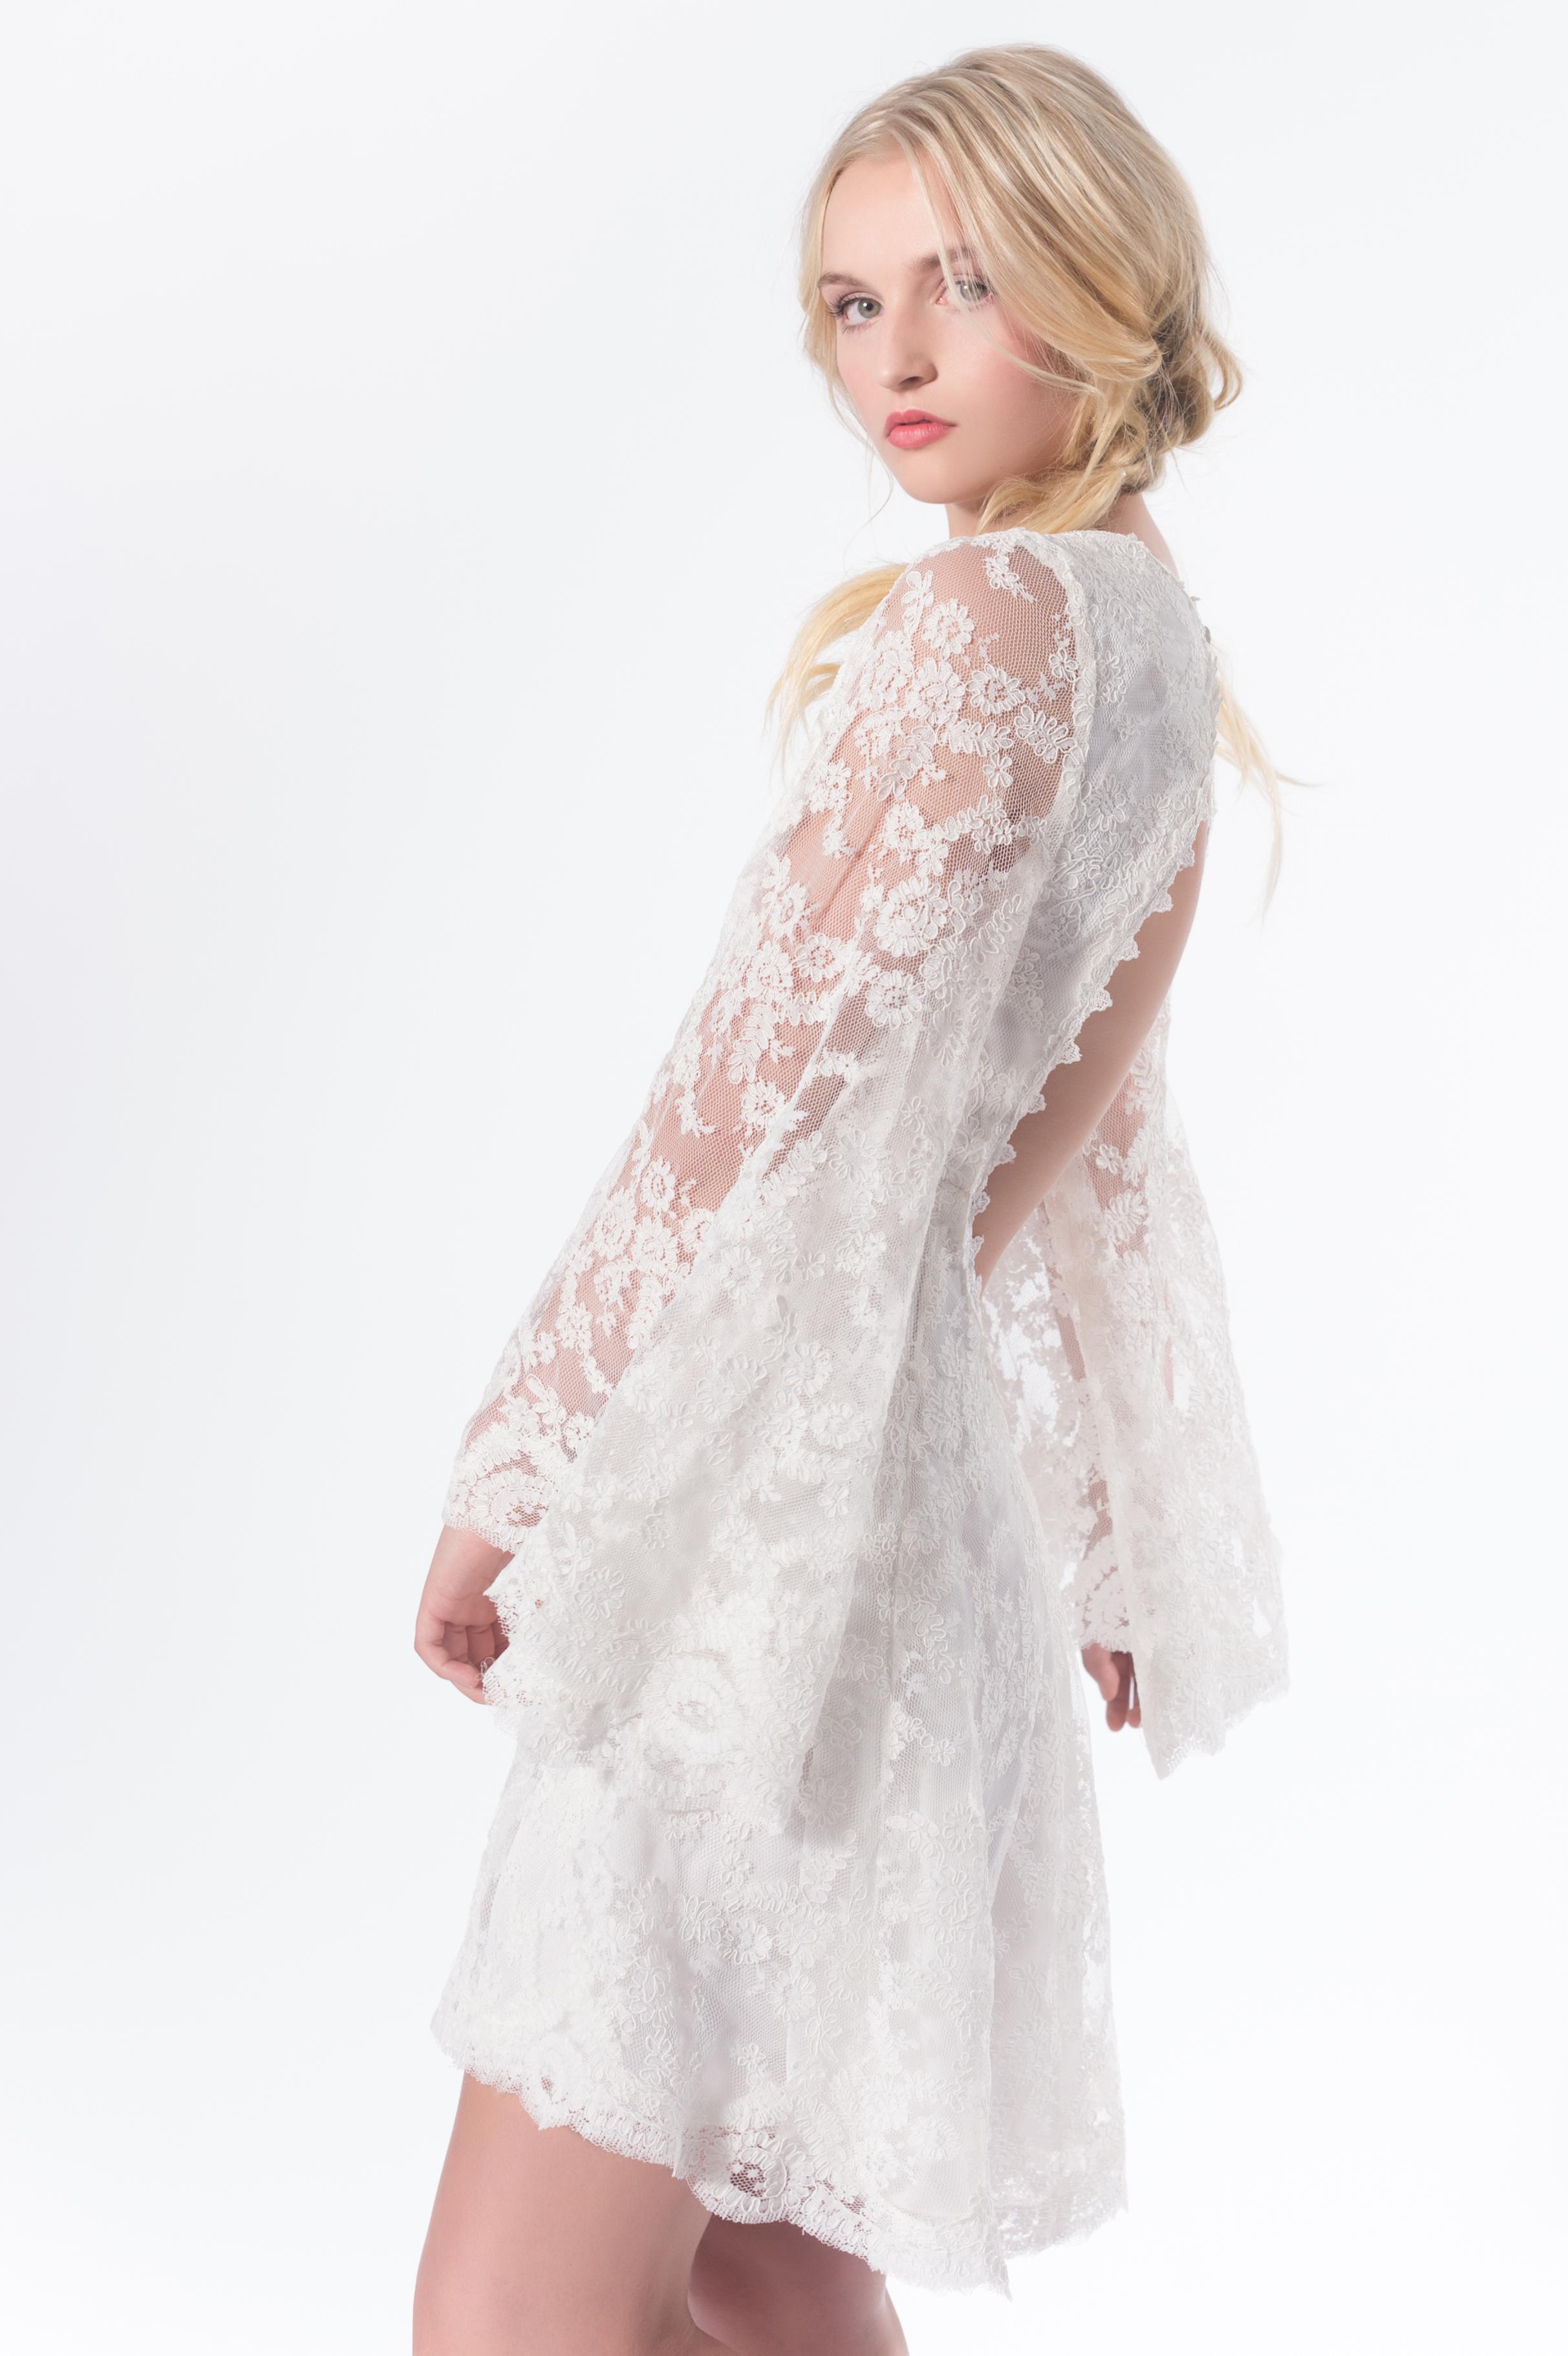 Clementine dress side.jpg